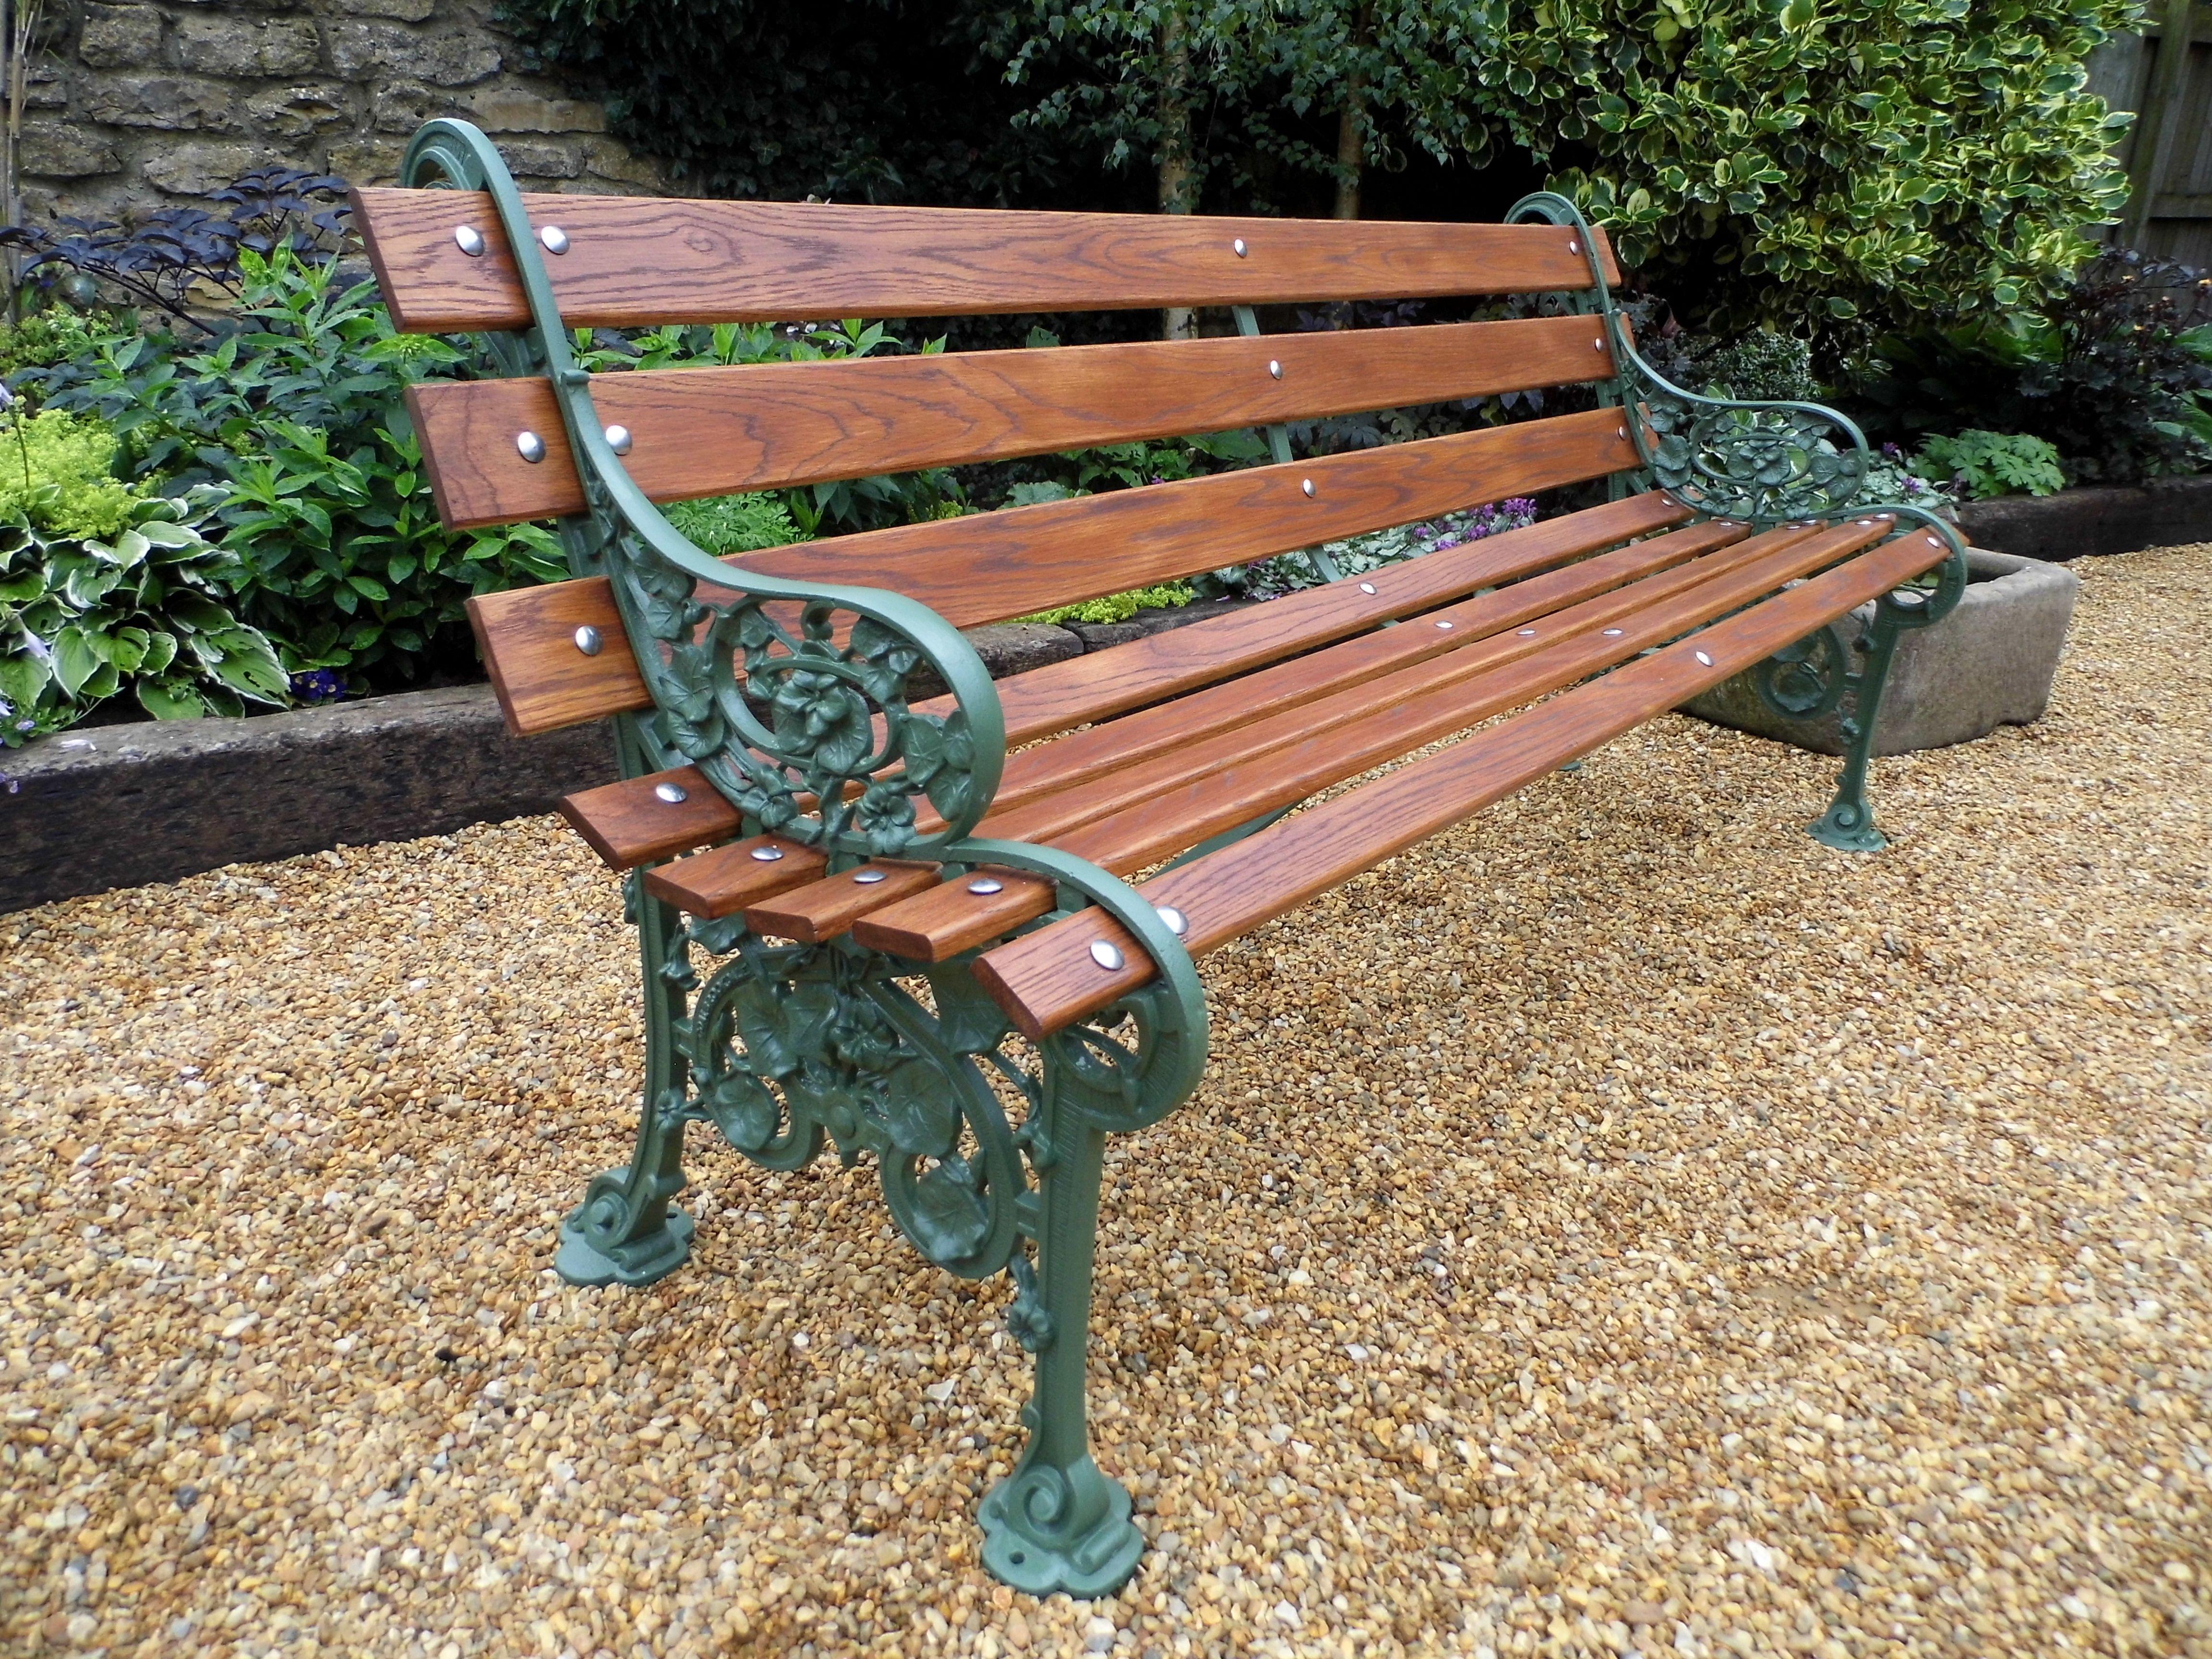 Coalbrookdale Nasturtium Slatted Bench Fully Restored By 400 x 300